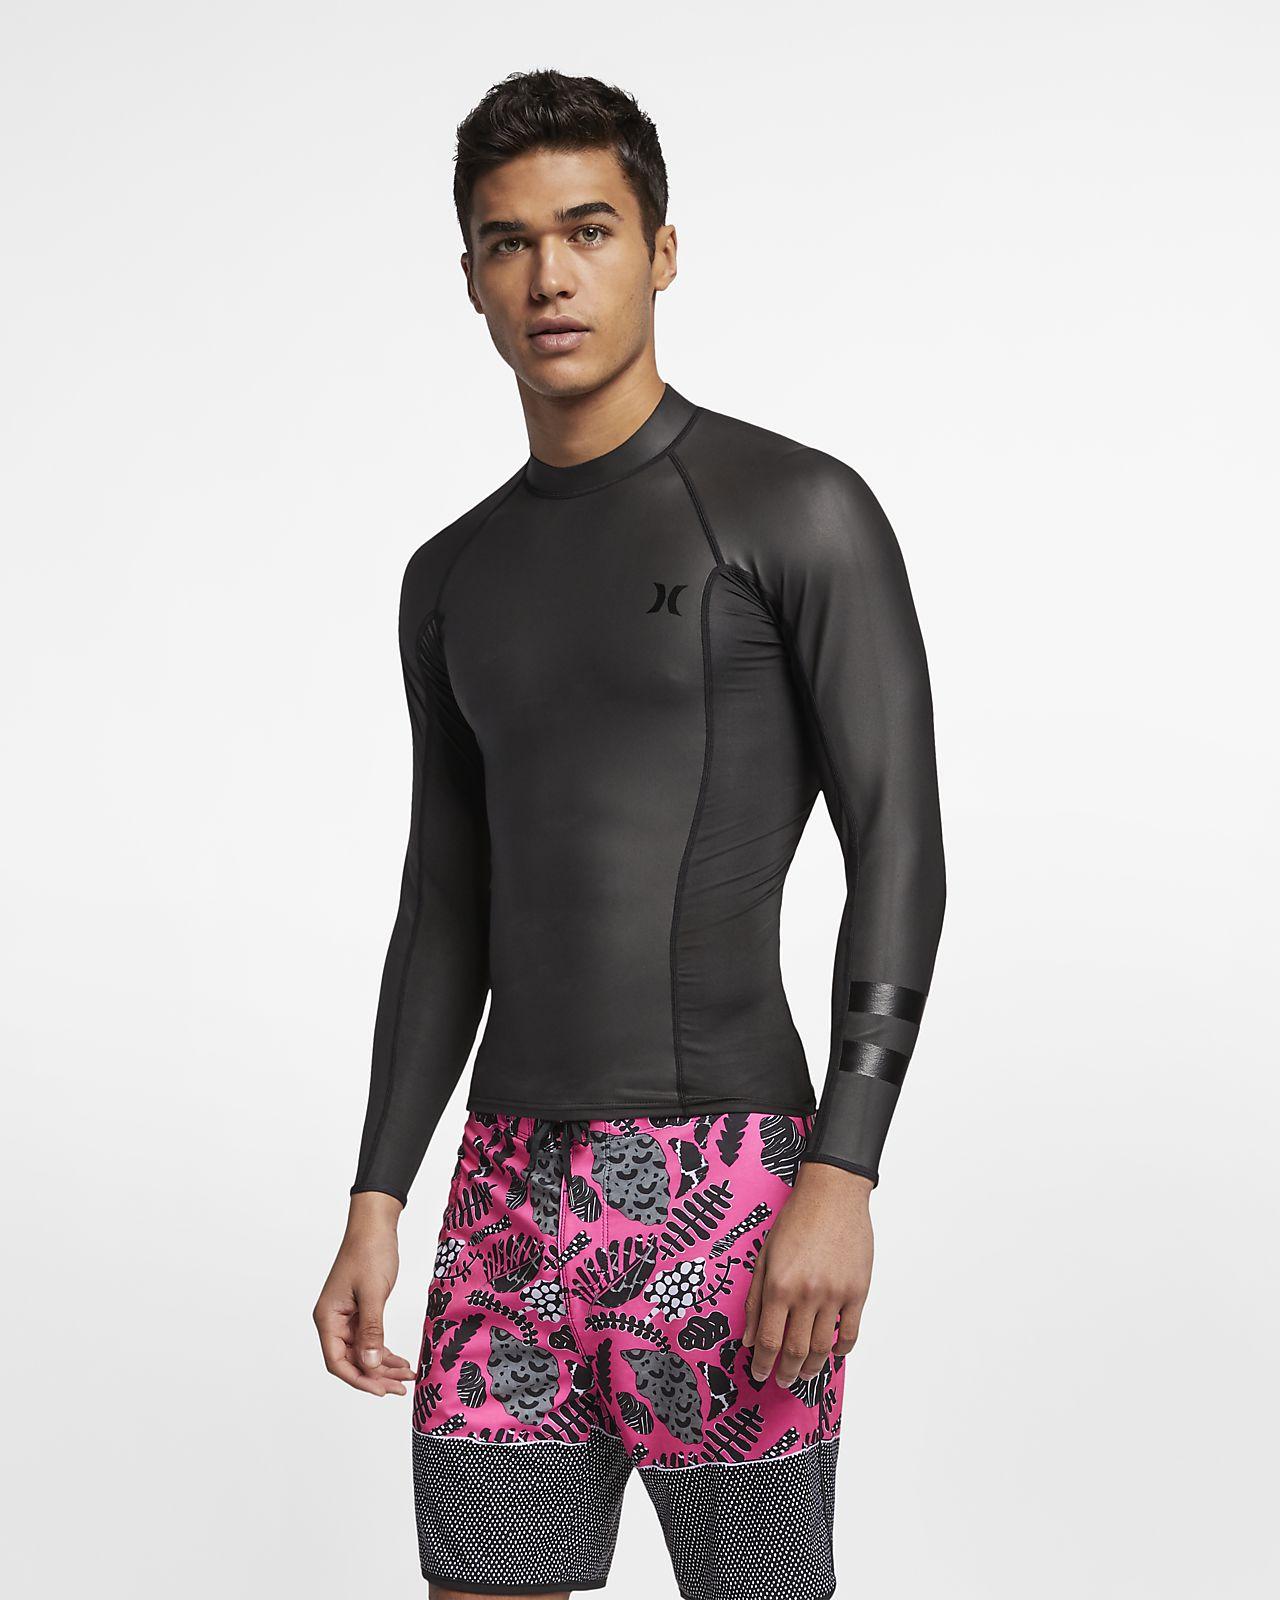 Hurley Pro Max Men's Long-Sleeve Surf Top